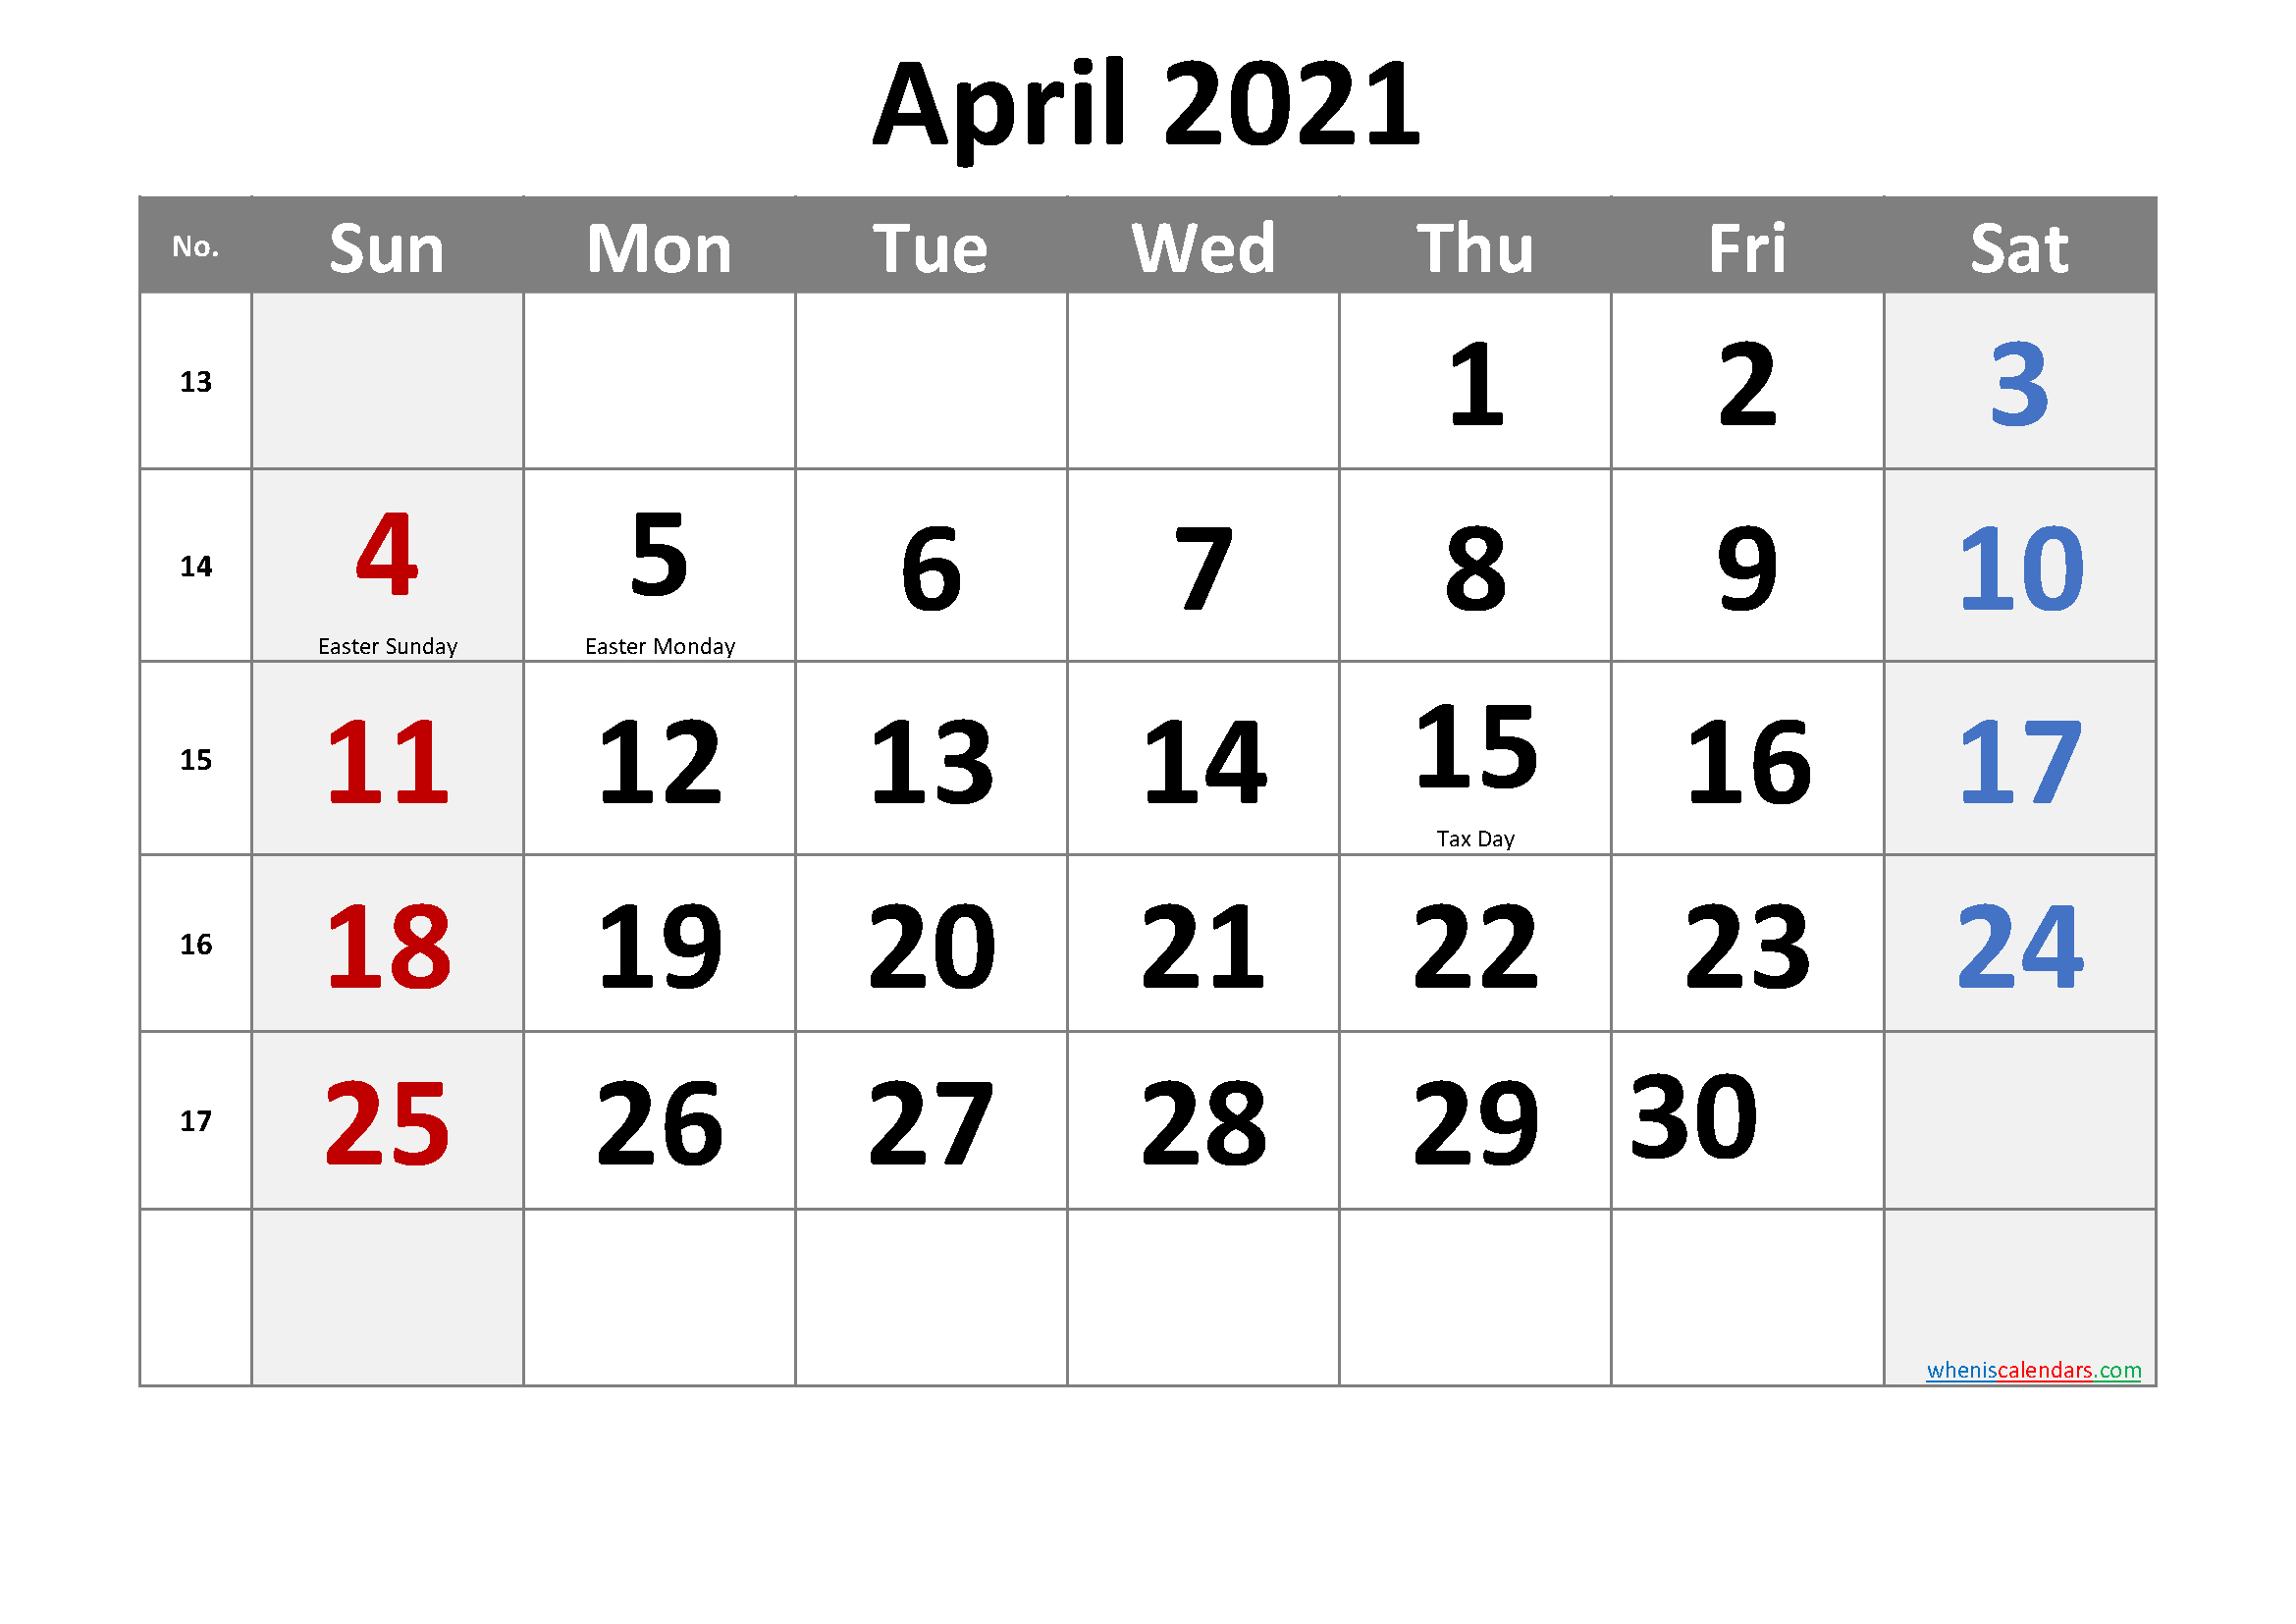 Free Printable April 2021 Calendar In 2020 | Printable